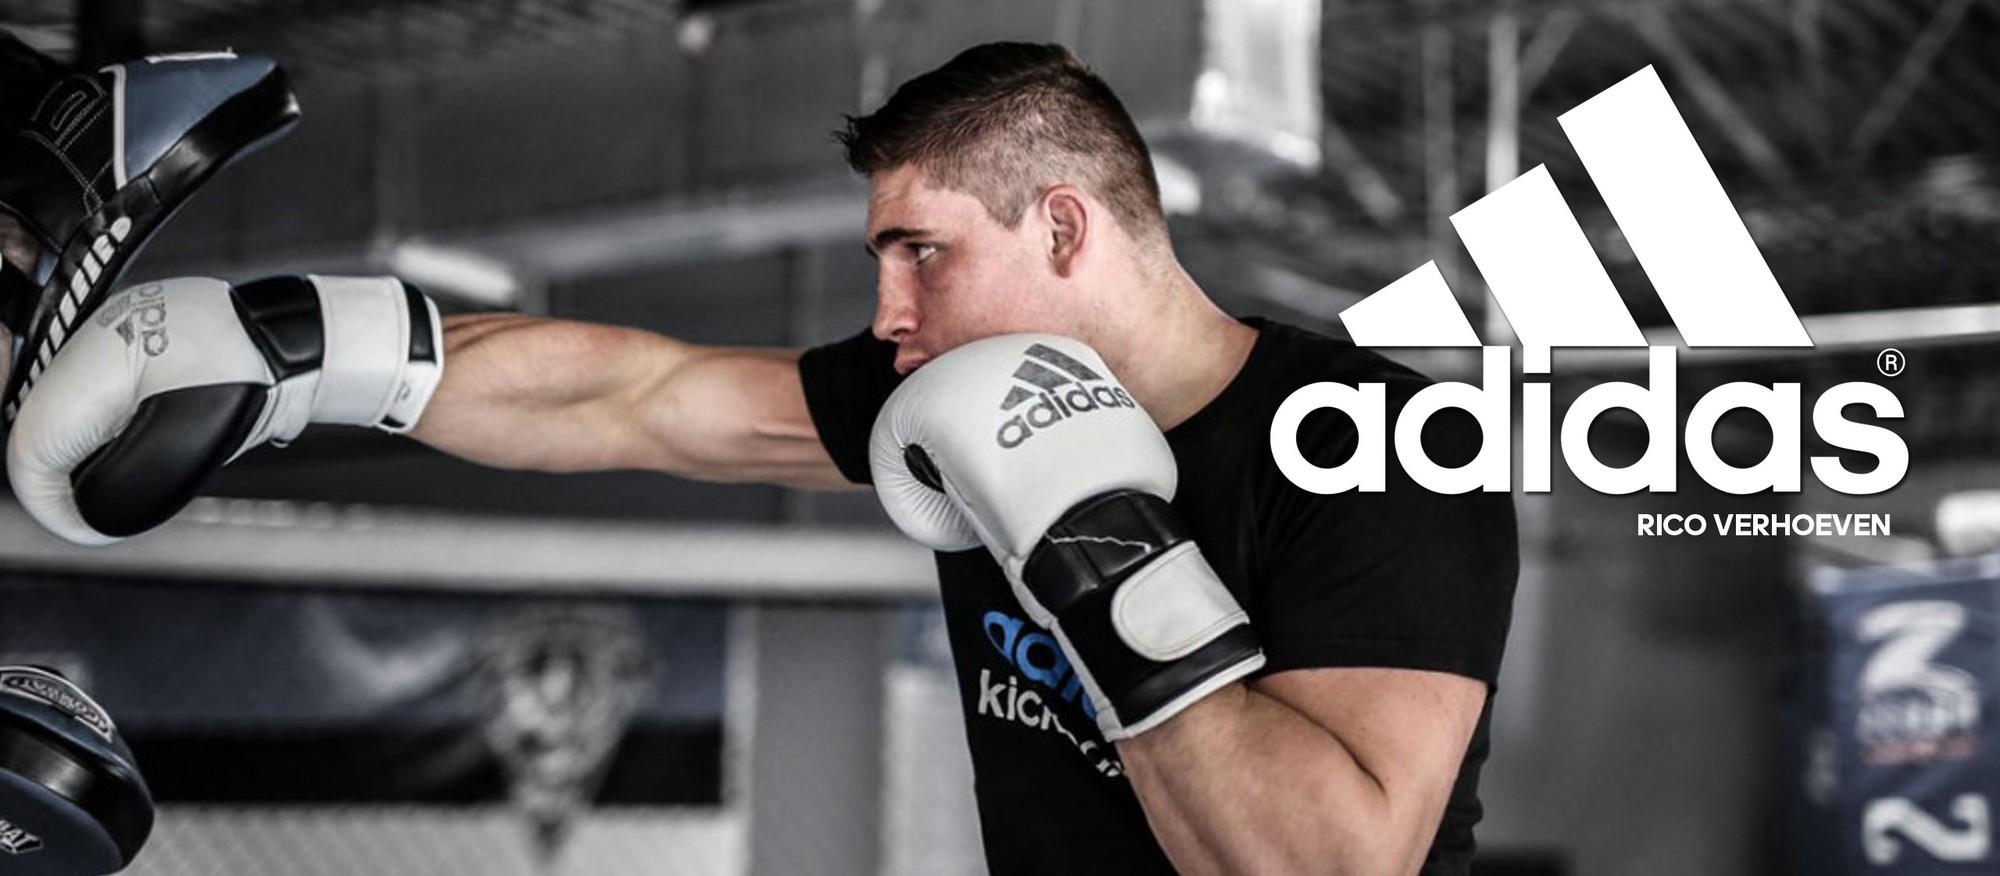 Adidas Rico Verhoeven